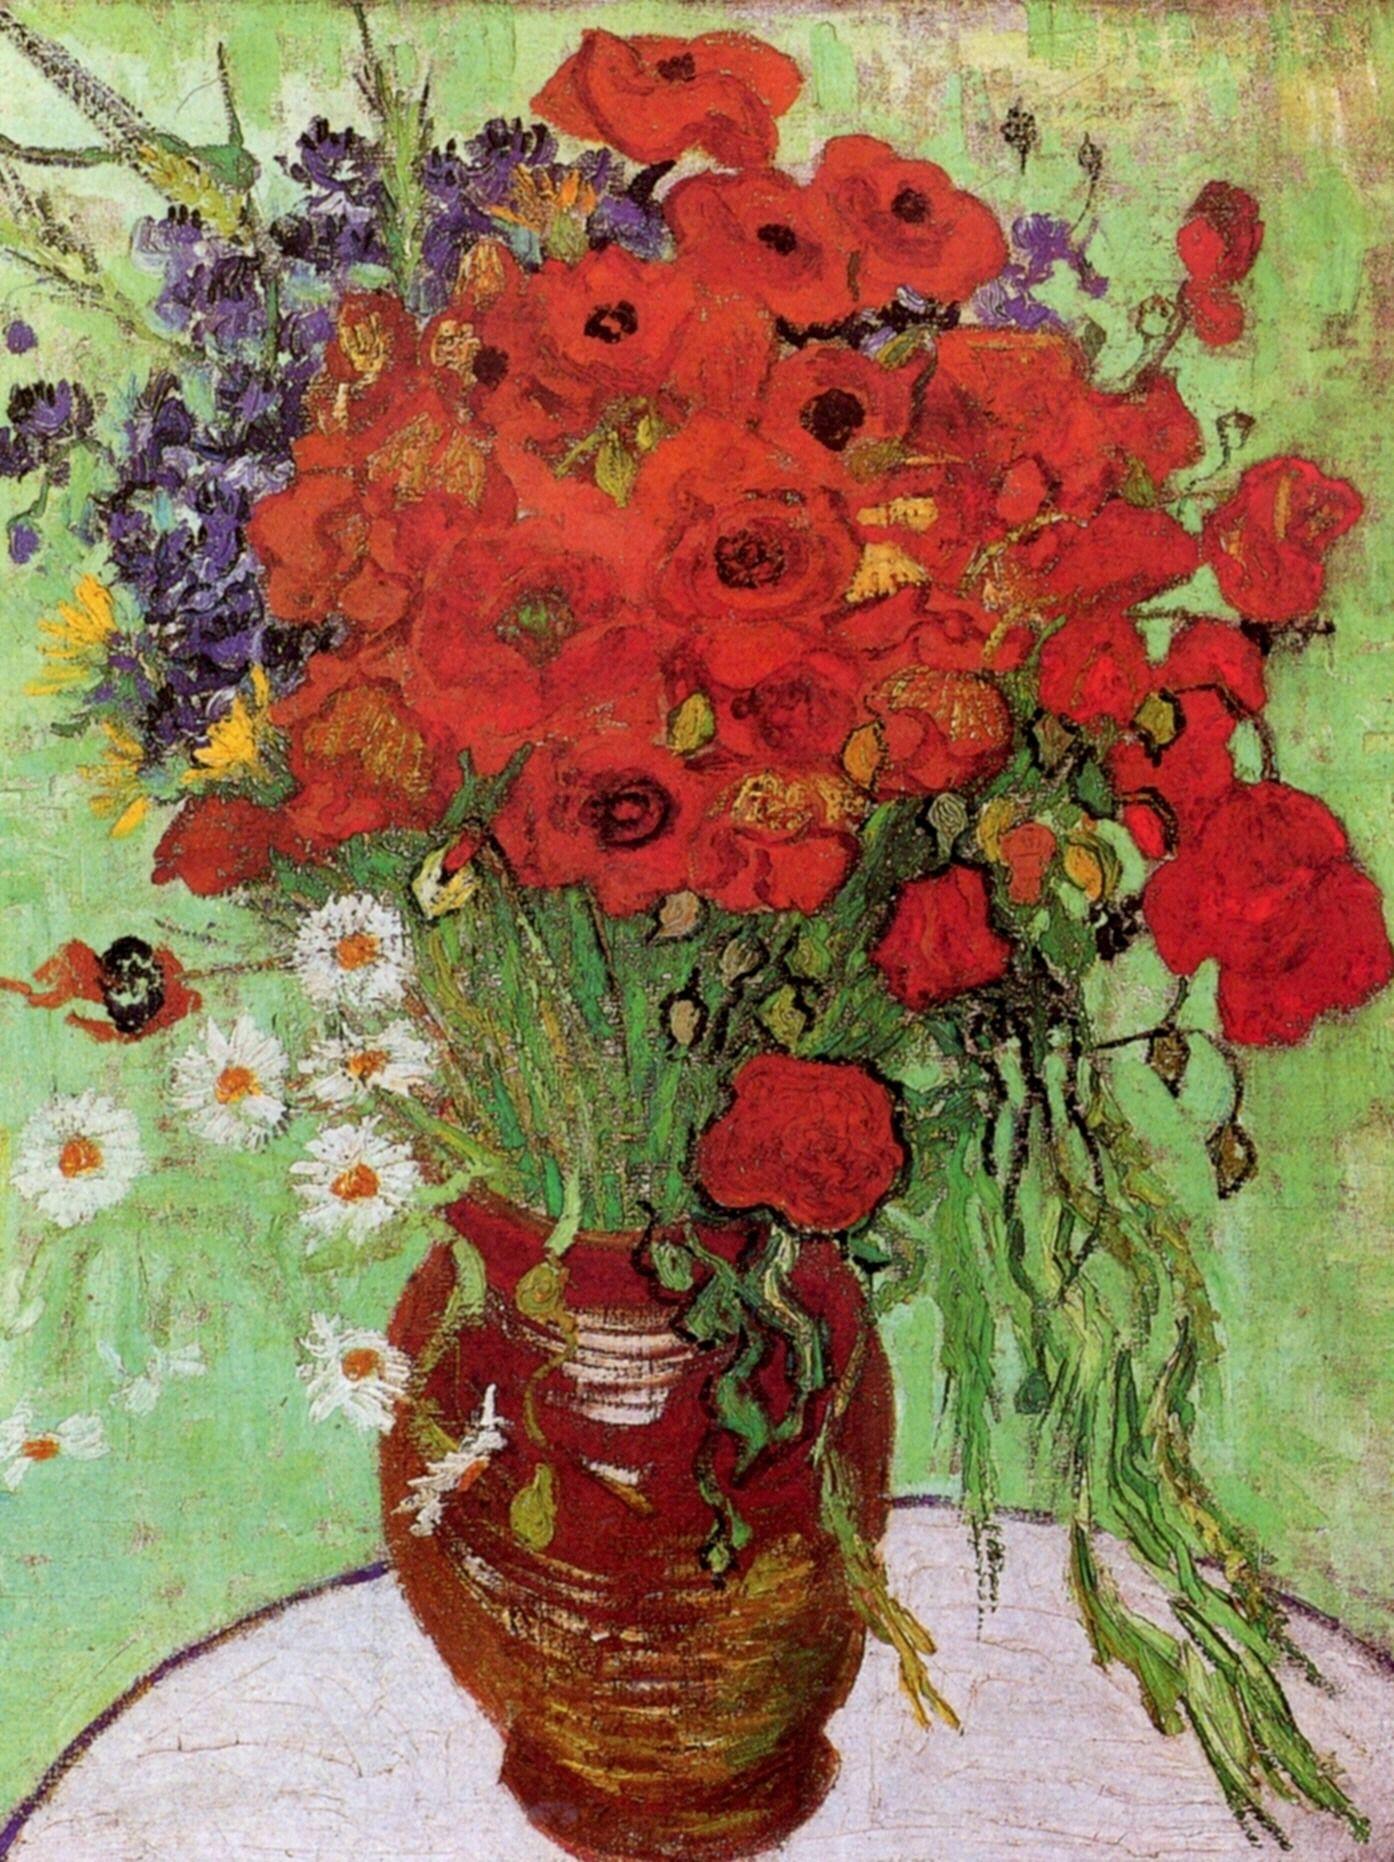 Mazzo Di Fiori Van Gogh.Red Poppies And Daisies Vincent Van Gogh Flores Pintadas Arte